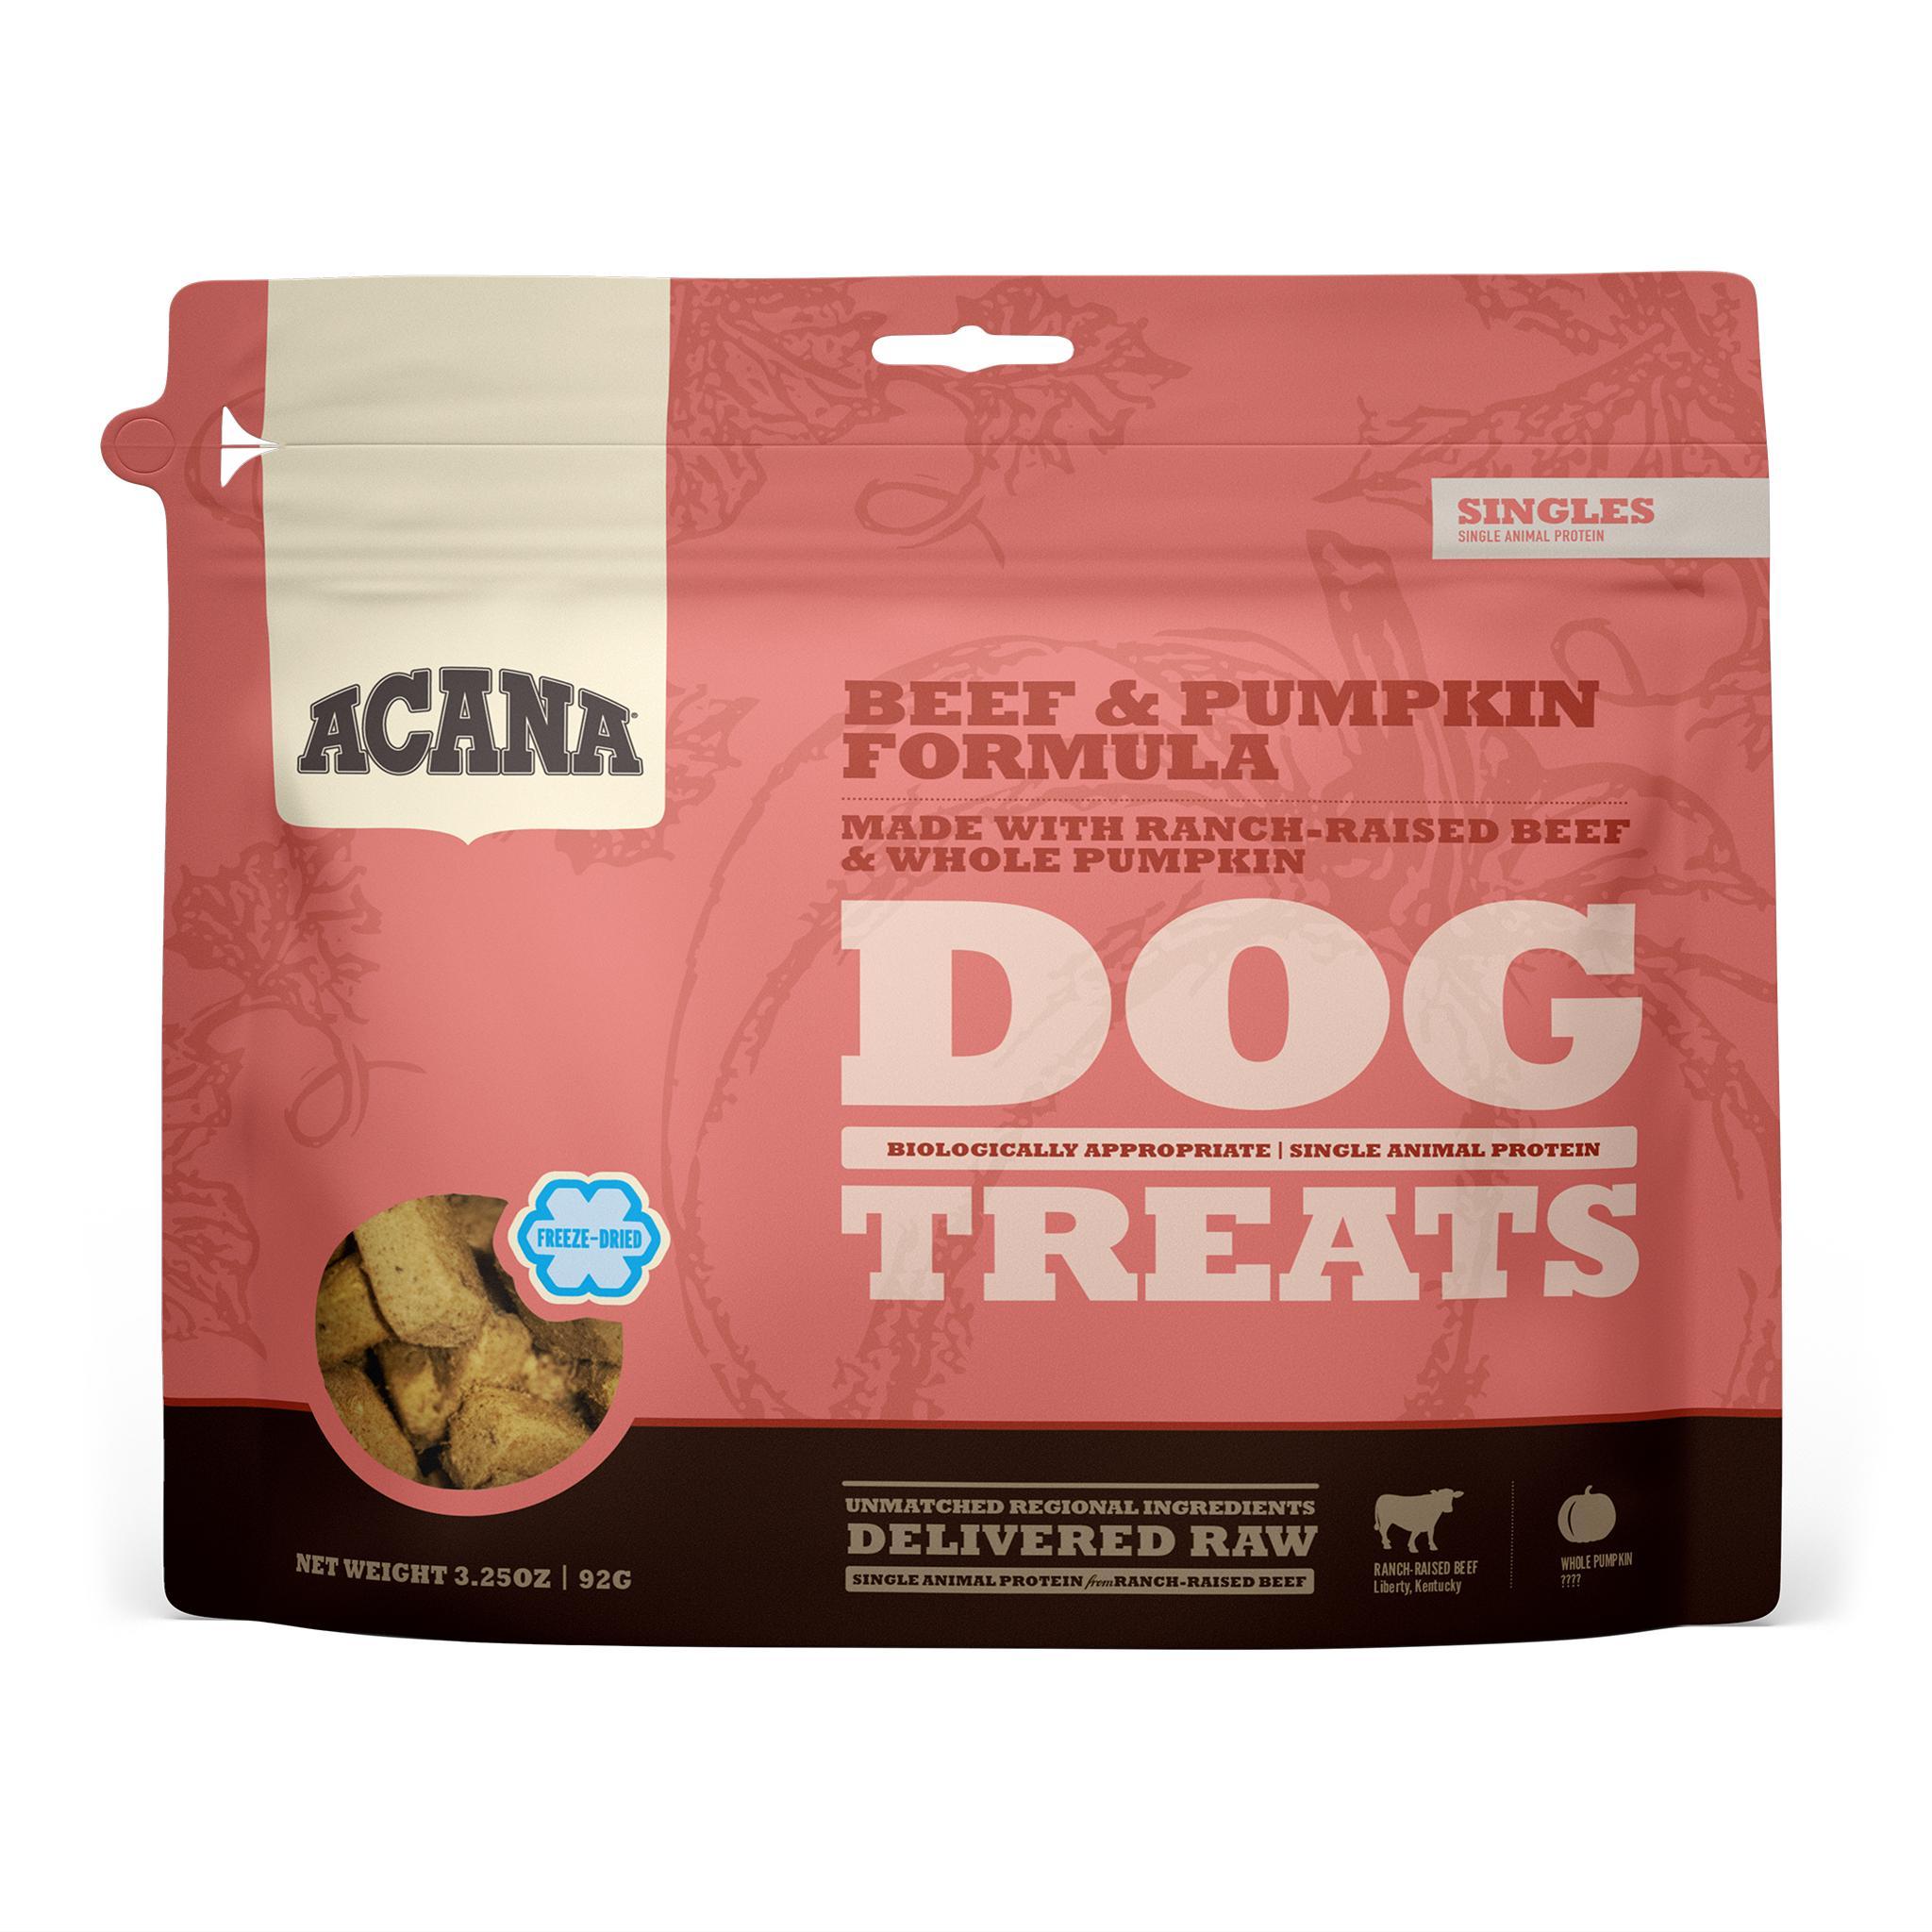 ACANA Singles Beef & Pumpkin Grain-Free Freeze-Dried Dog Treats, 3.25-oz